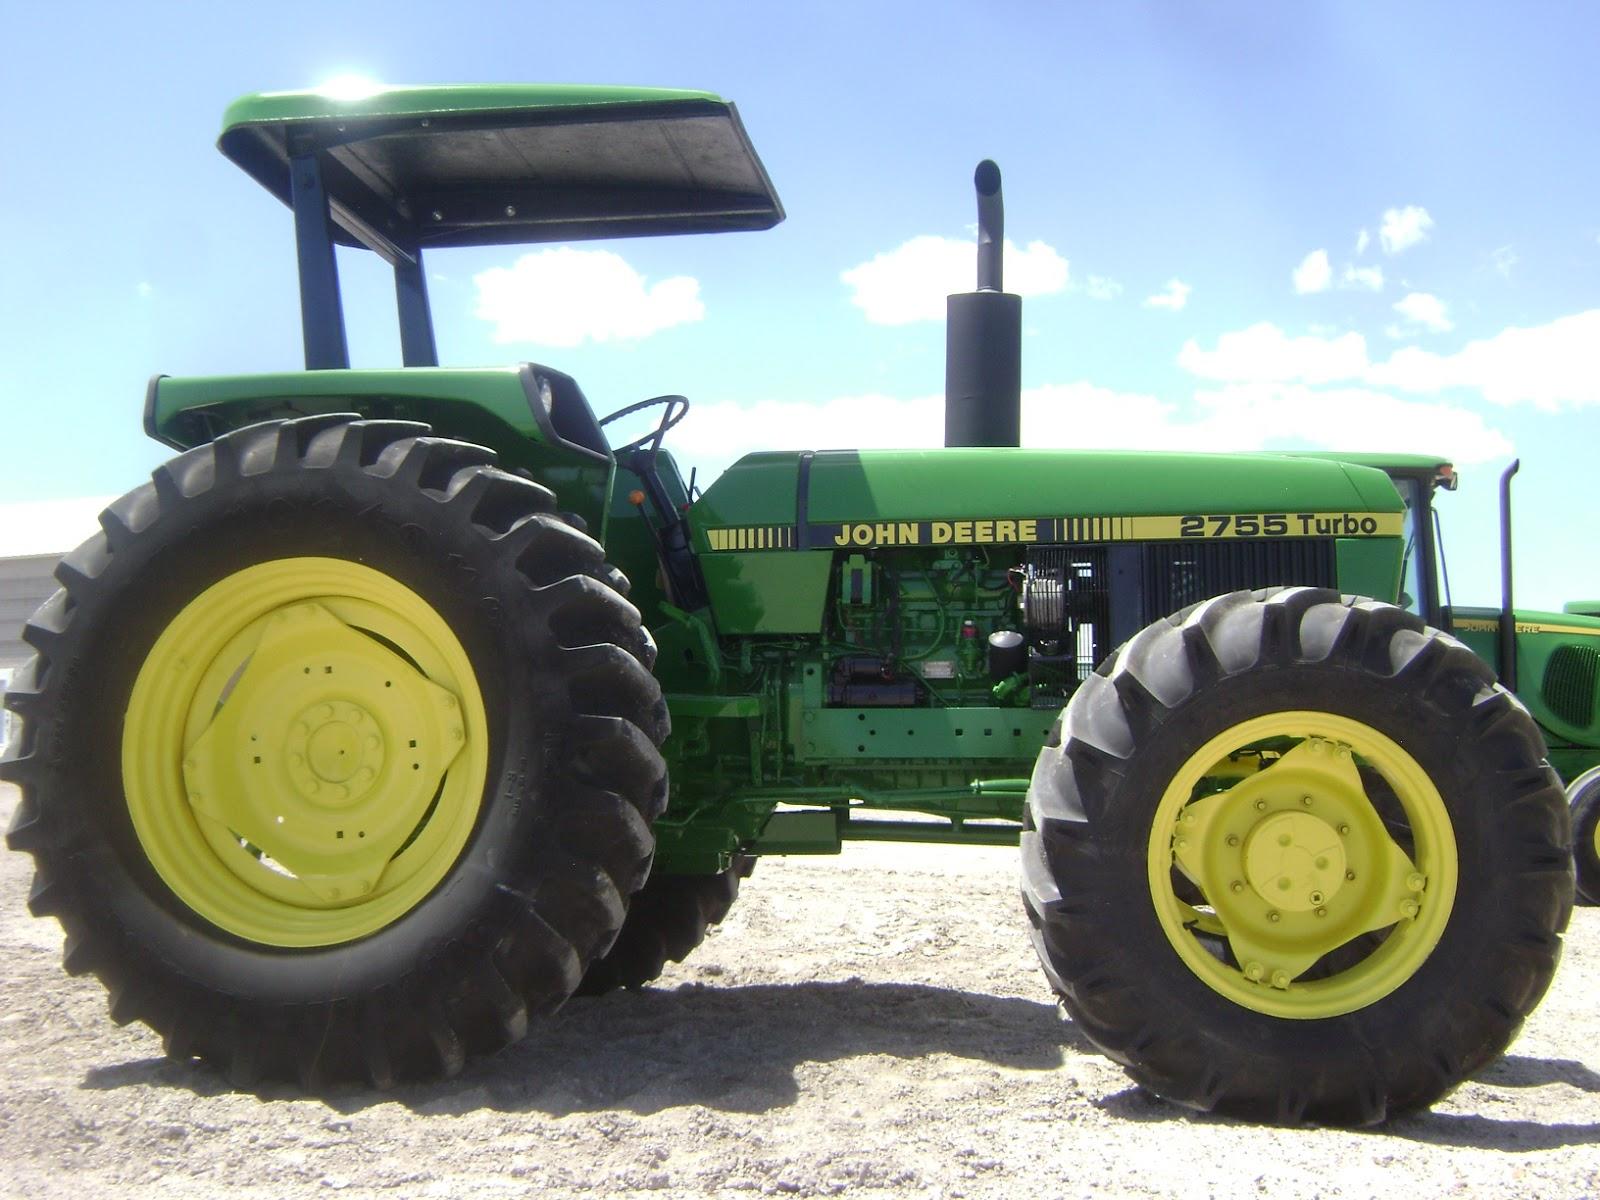 Industrial For Donaar Bab Zadeh  Tractor John Deere 2755 4x4  19 900 Dlls  Turbo Sincr U00f3n  1994